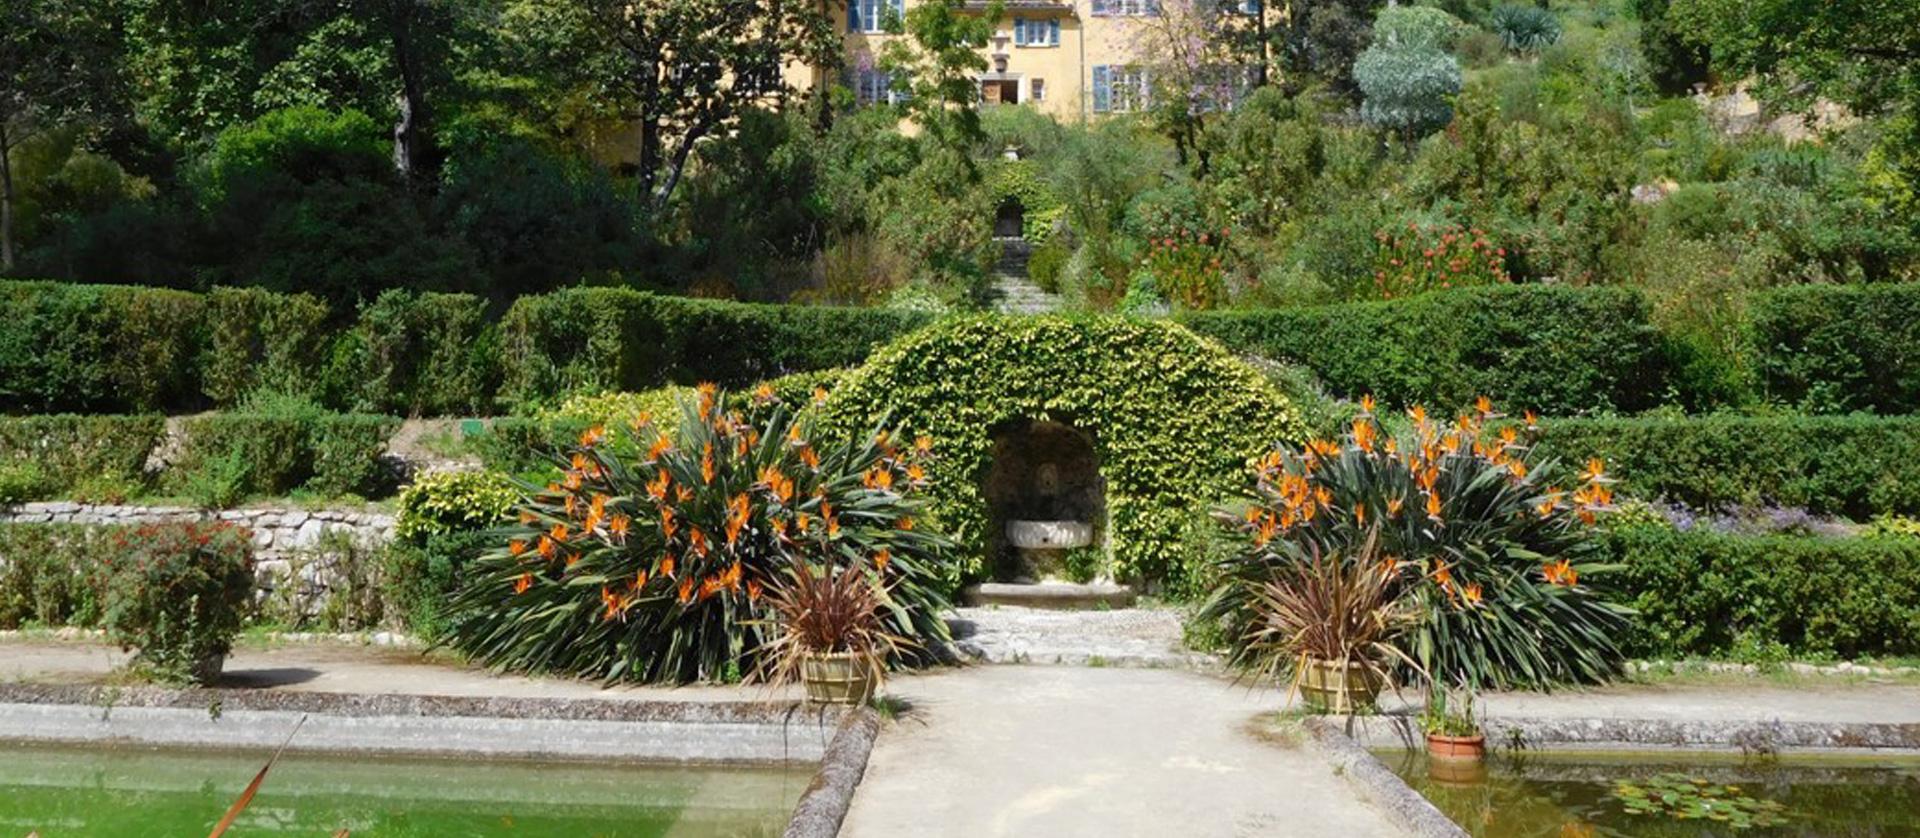 John-Horsey-Horticulture-Gardening-Somerset